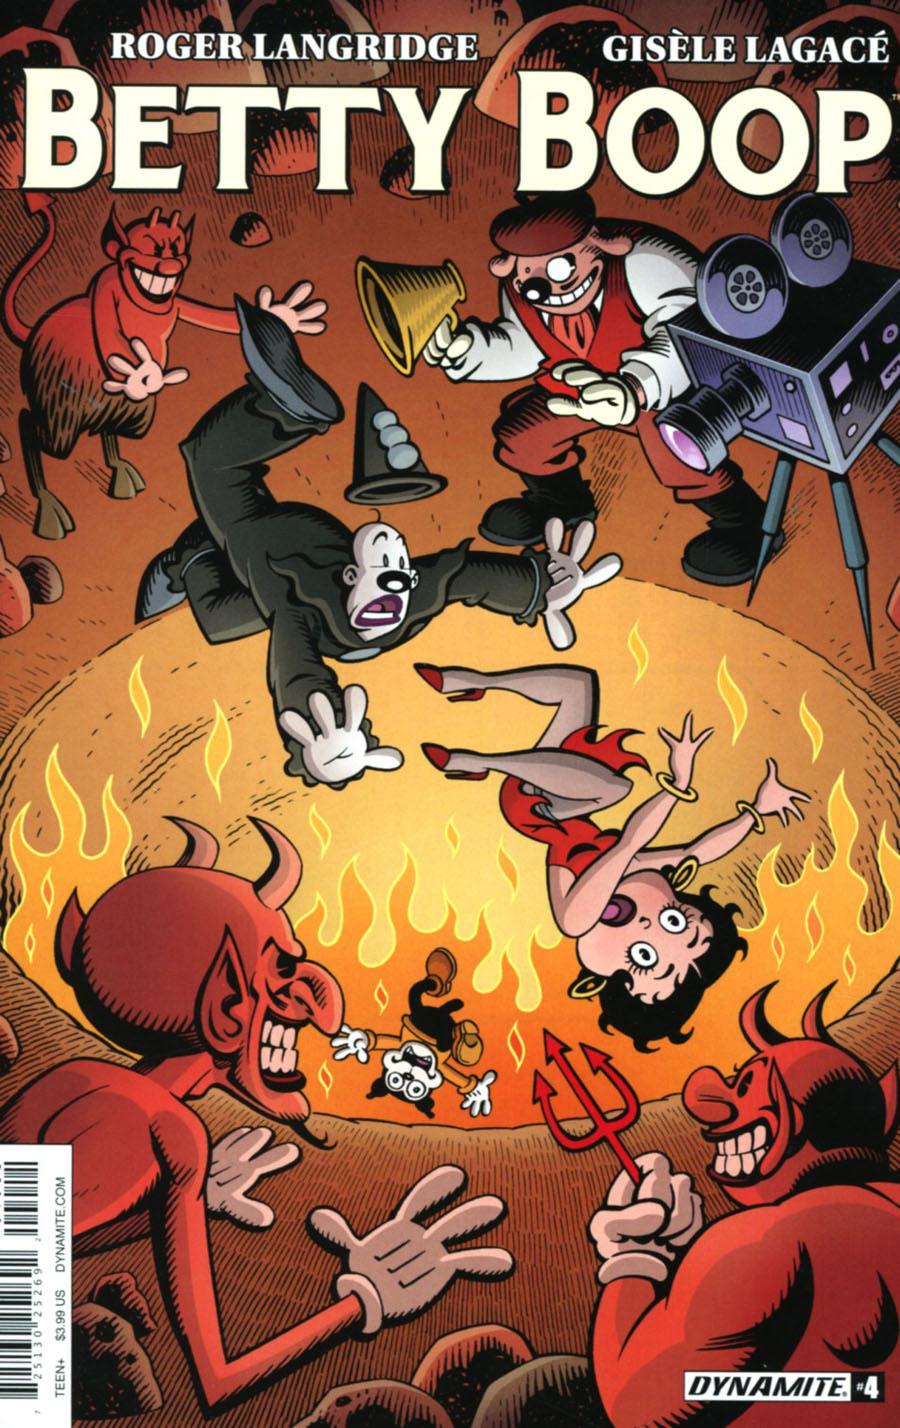 Betty Boop #4 Cover A Regular Roger Langridge Cover